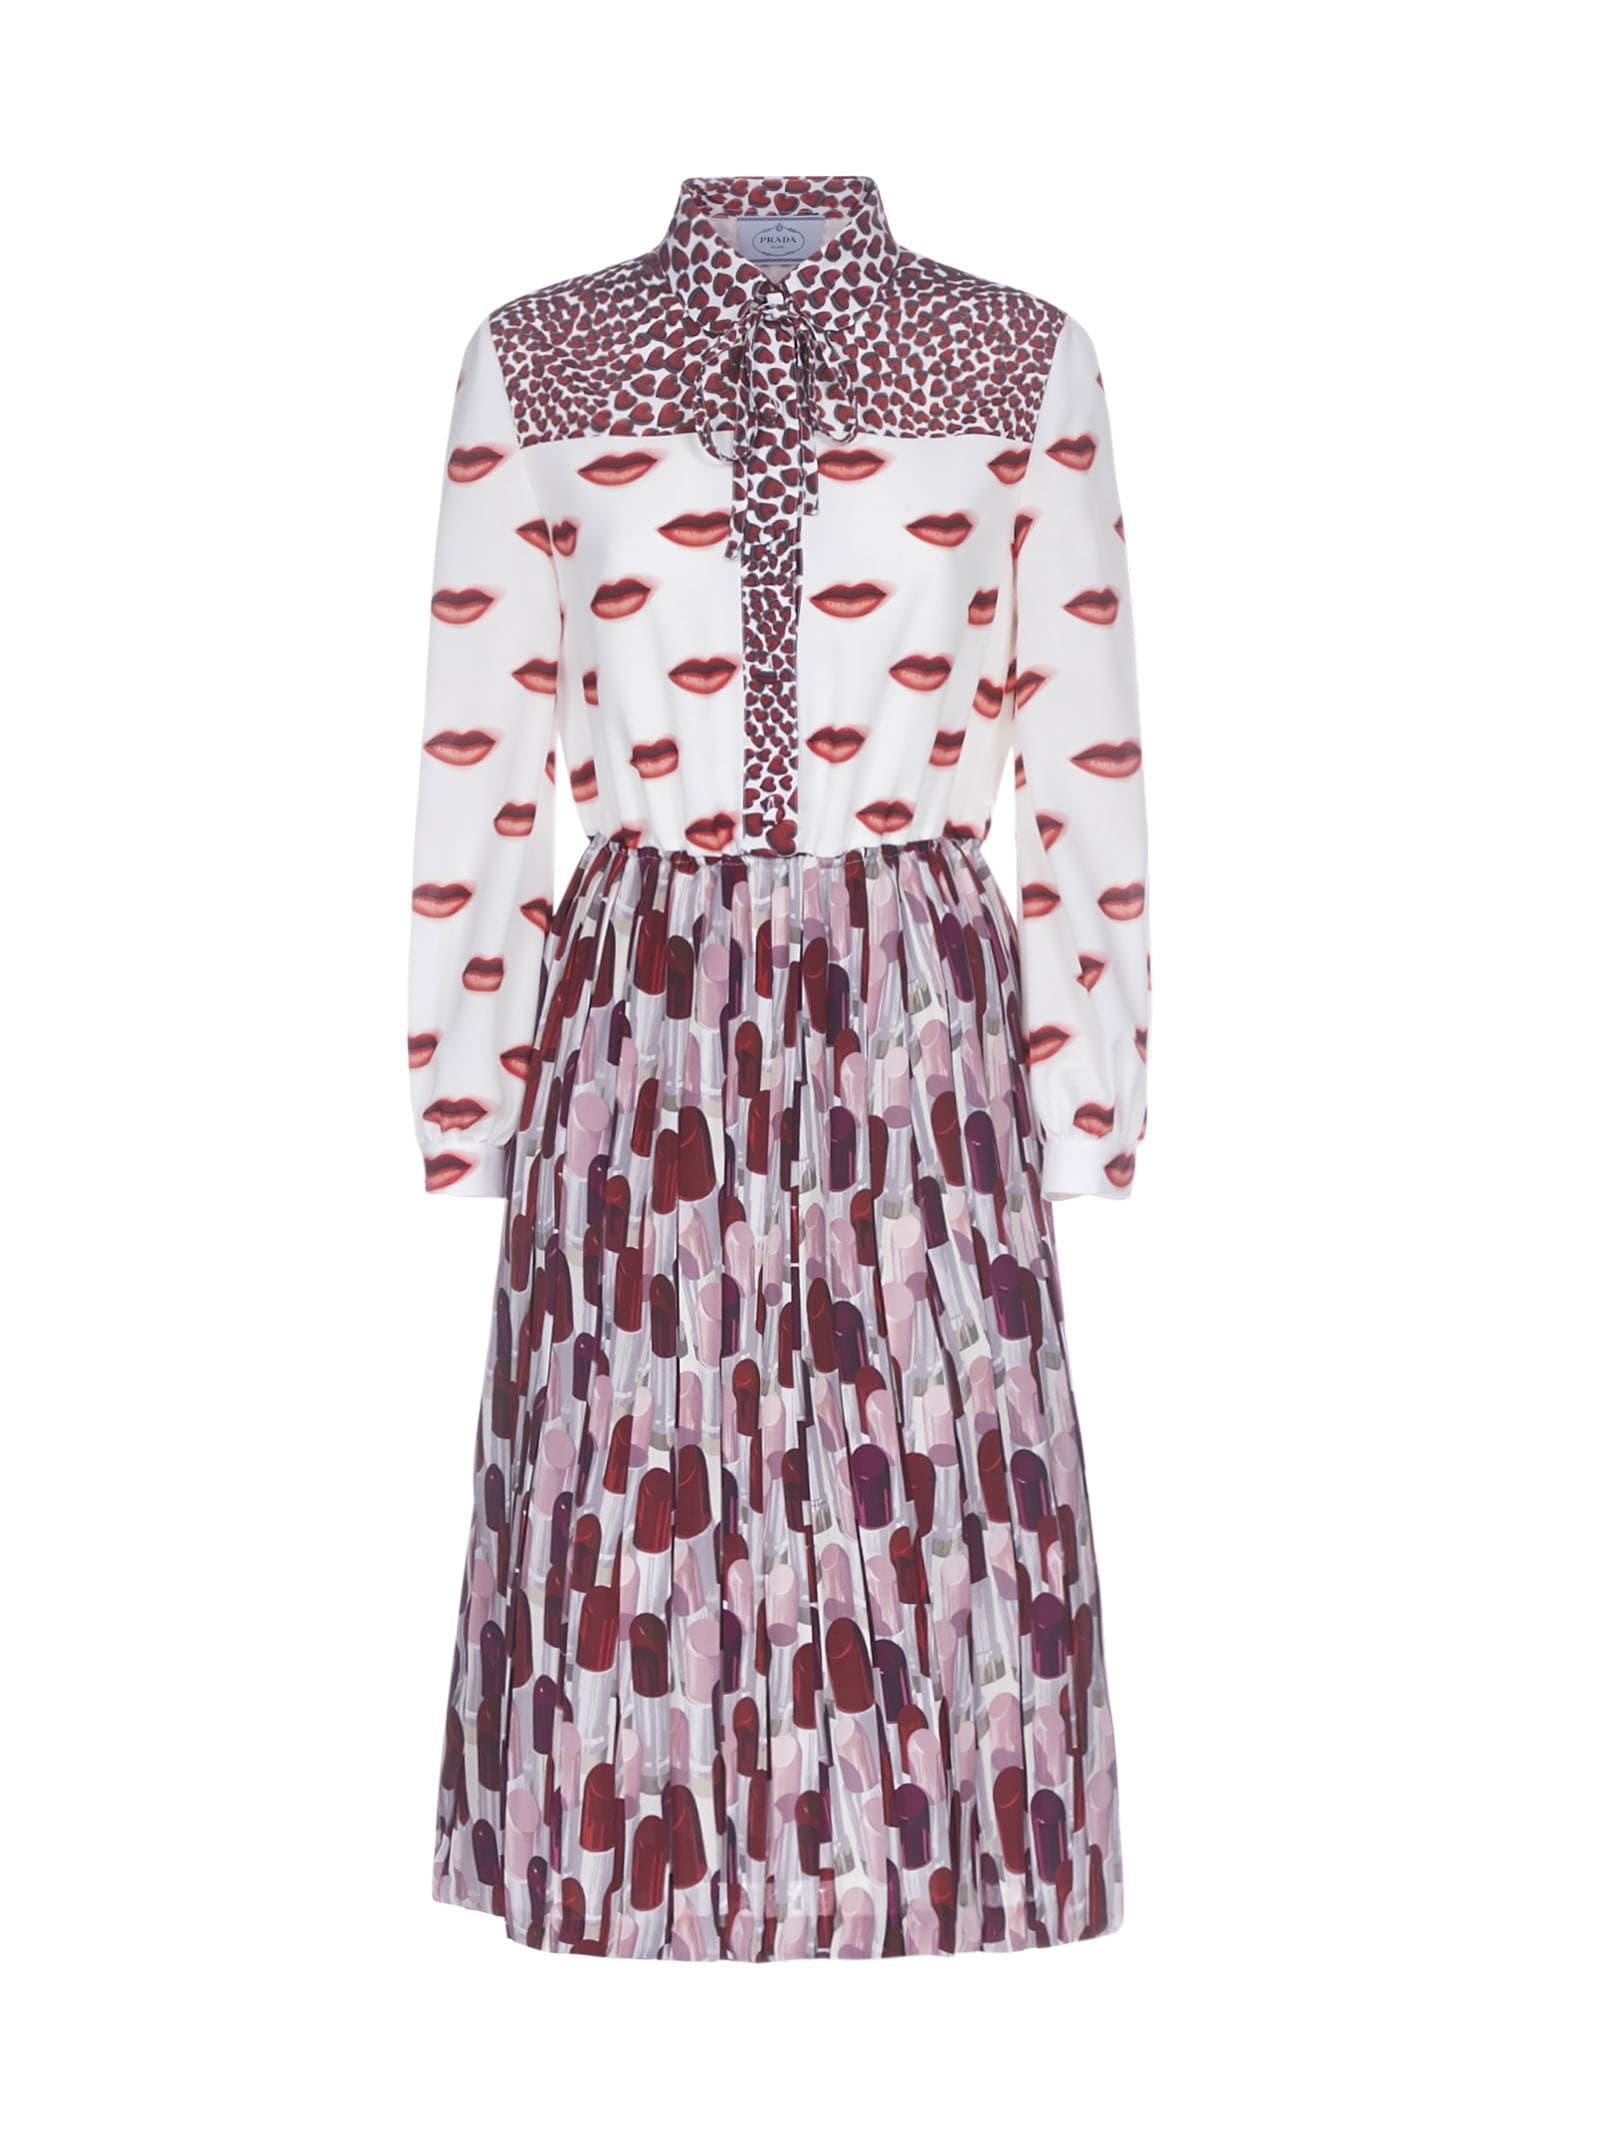 Buy Prada Lipstick Bocca Cuore Dress online, shop Prada with free shipping